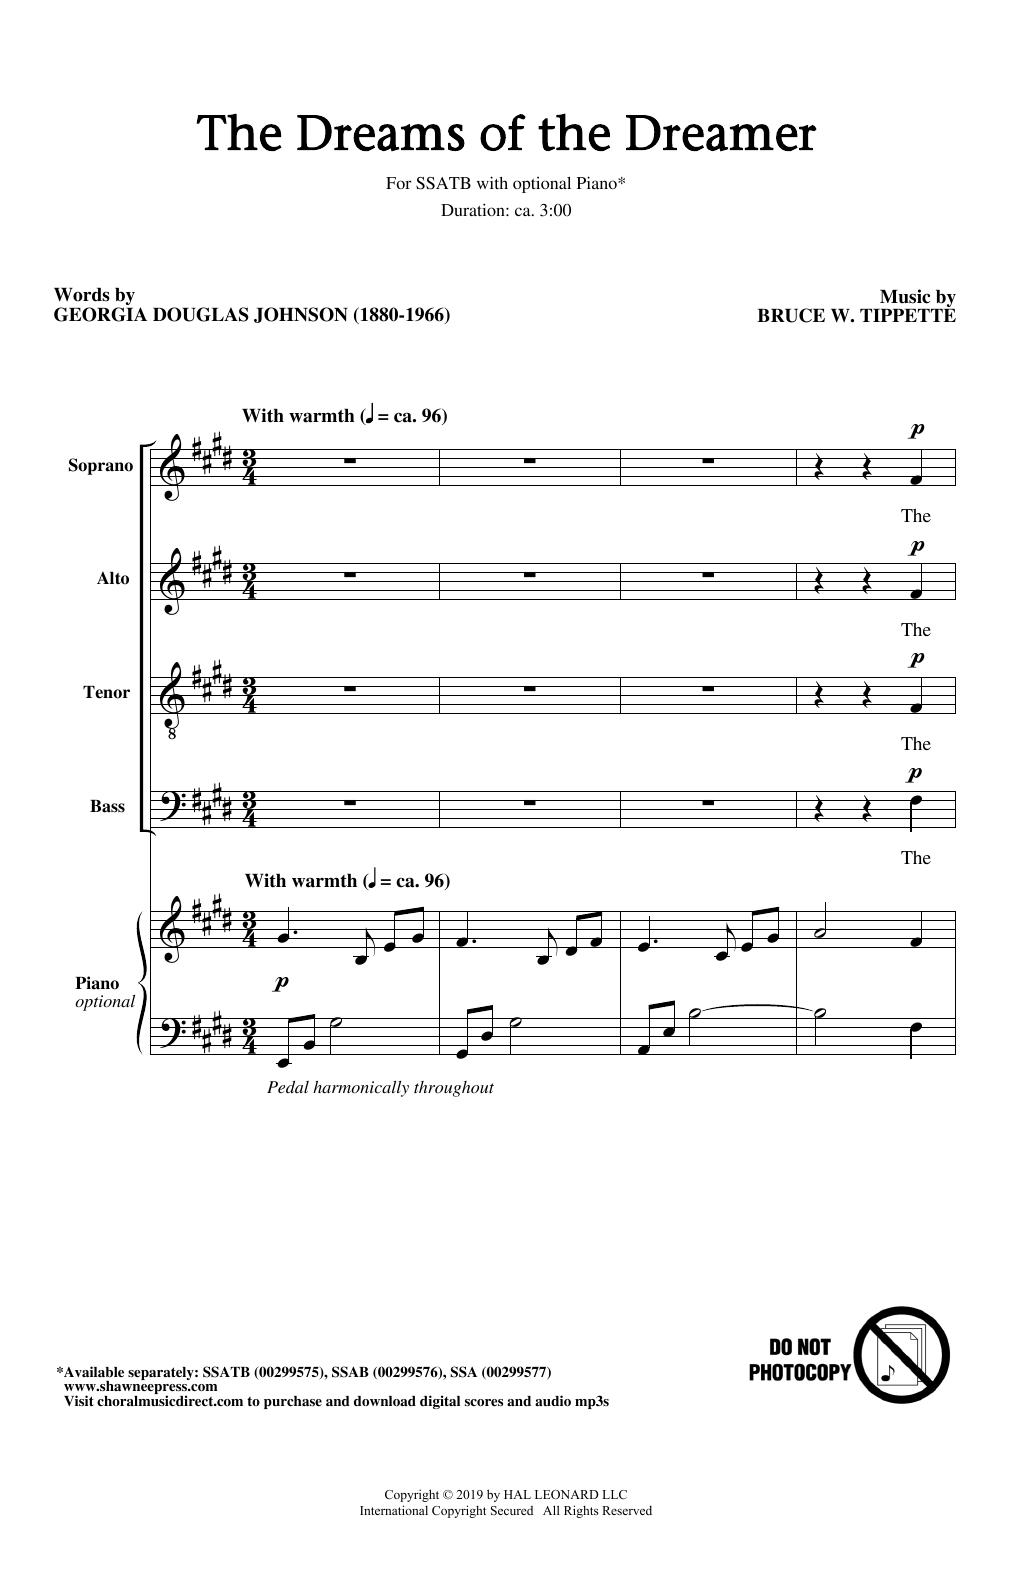 The Dreams Of The Dreamer (SSATB Choir)